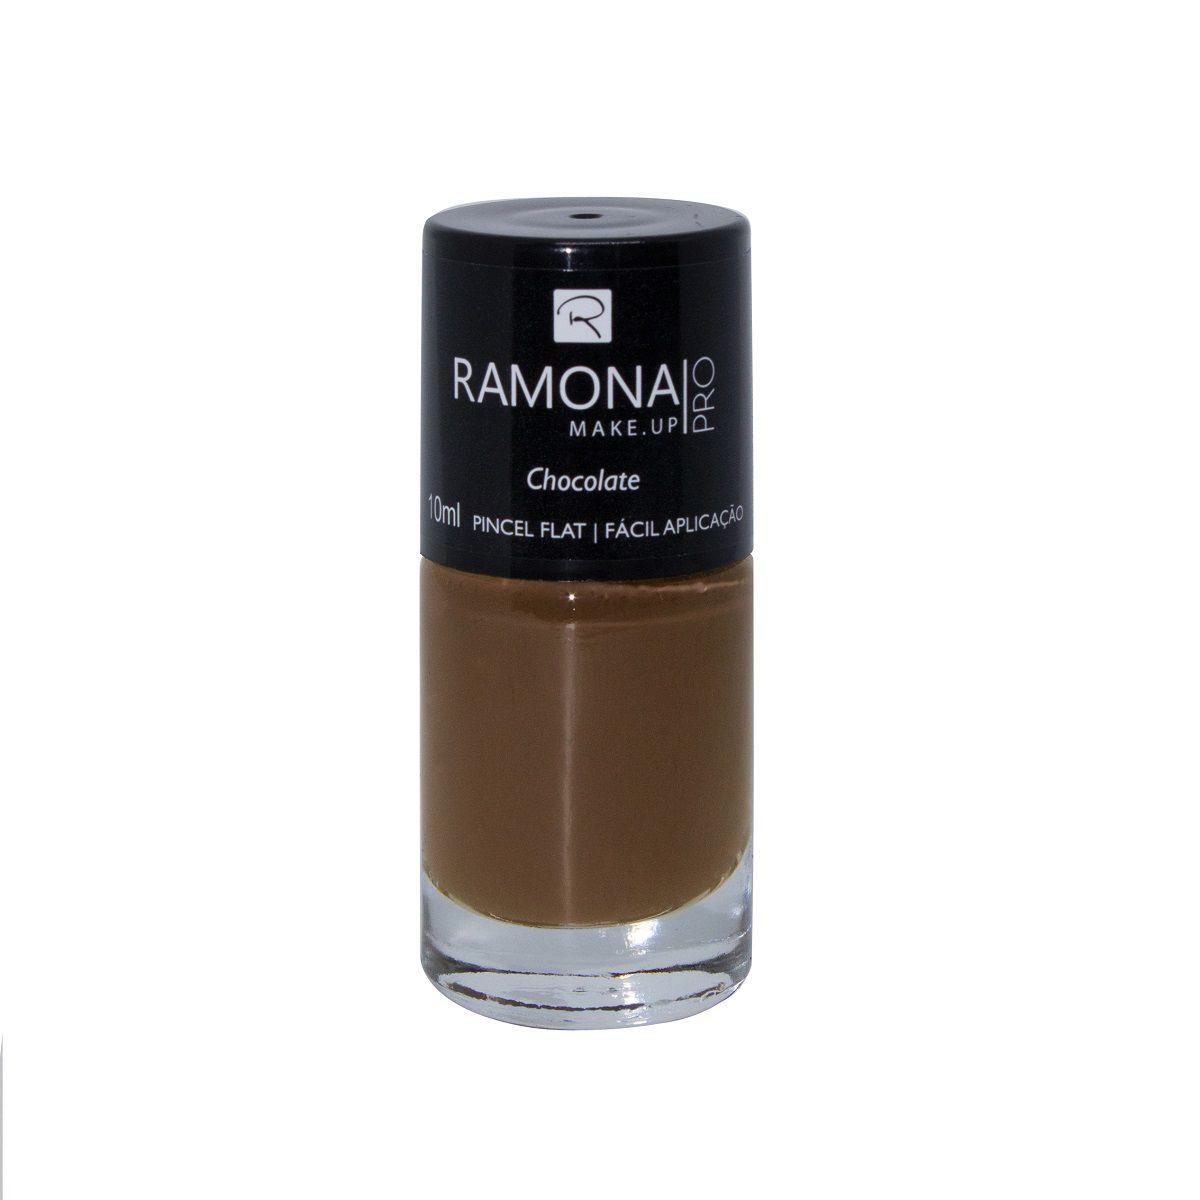 Esmalte cremoso Ramona Cosméticos Chocolate 10ml